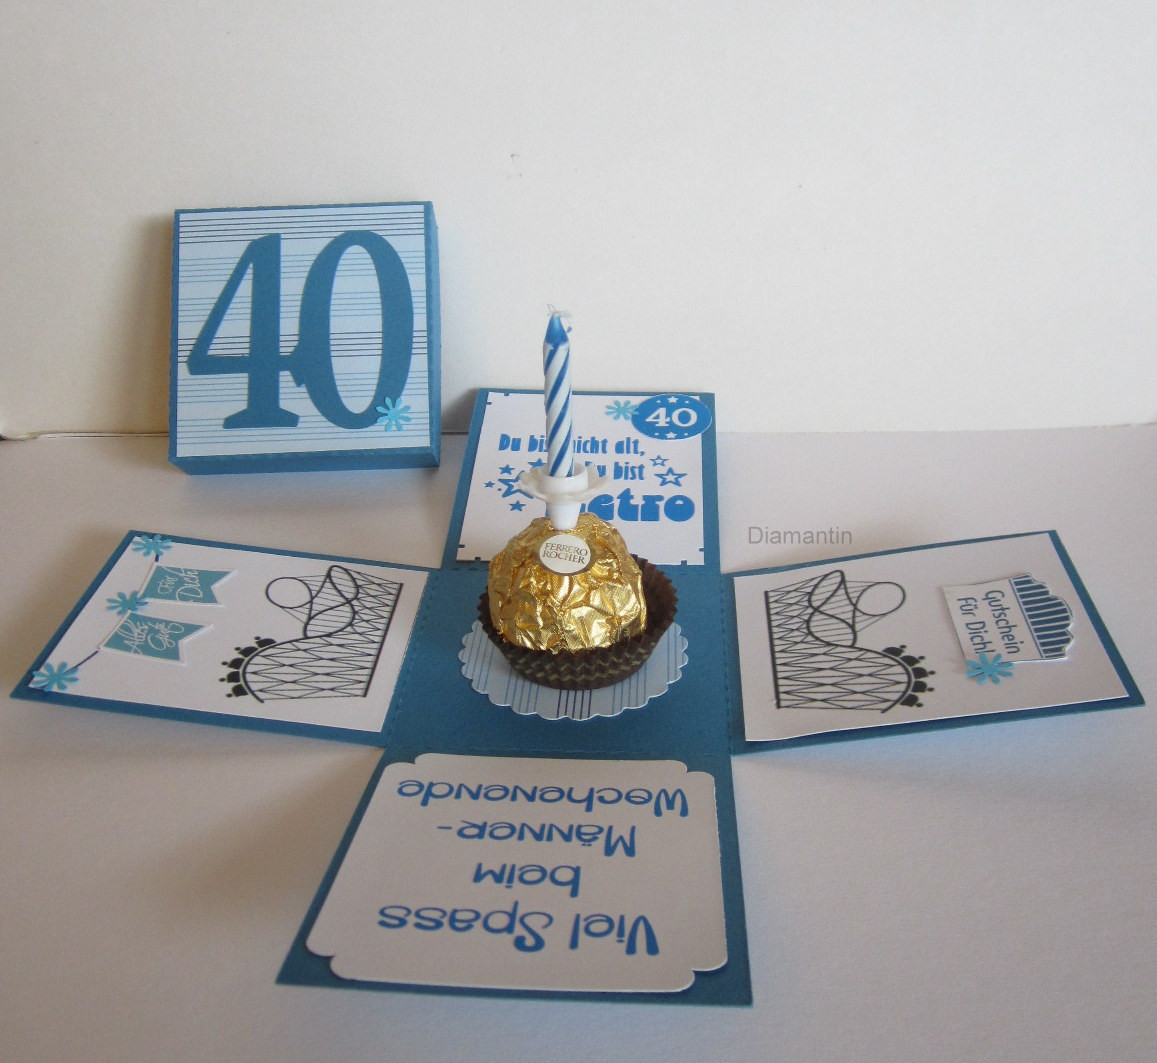 Geschenkideen Zum 40 Geburtstag  Diamantin´s Hobbywelt Geburtstagsset zum 40 Geburtstag